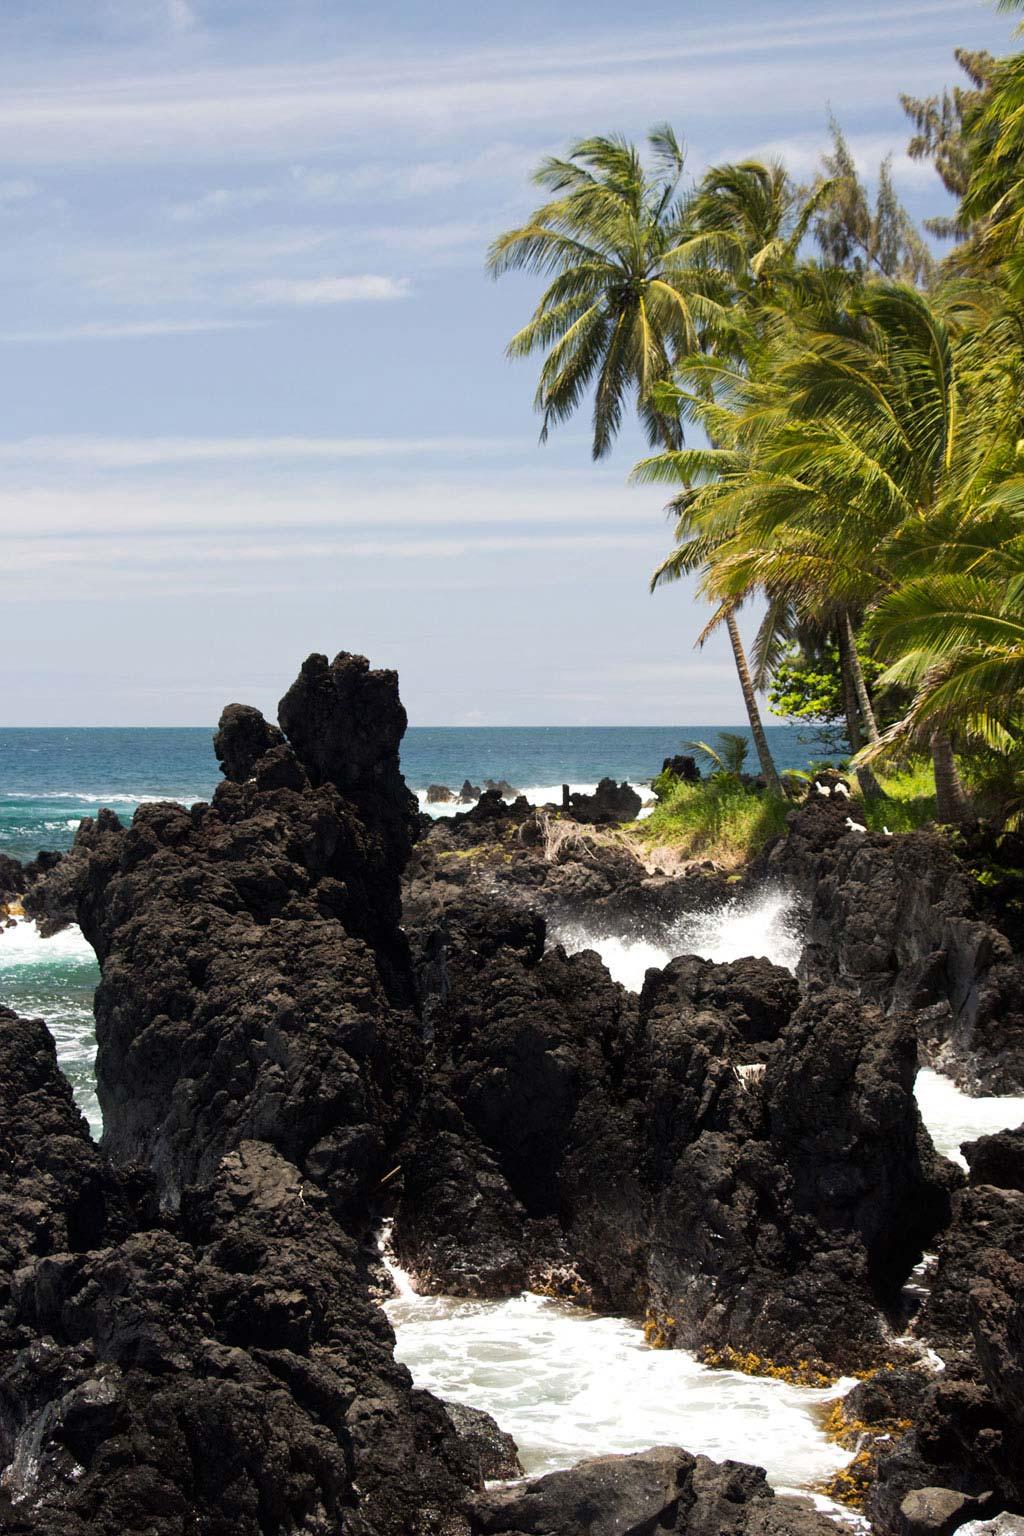 Maui Hawaii – Keanae Peninsula schwarze Felsenbucht am Meer | SOMEWHERE ELSE